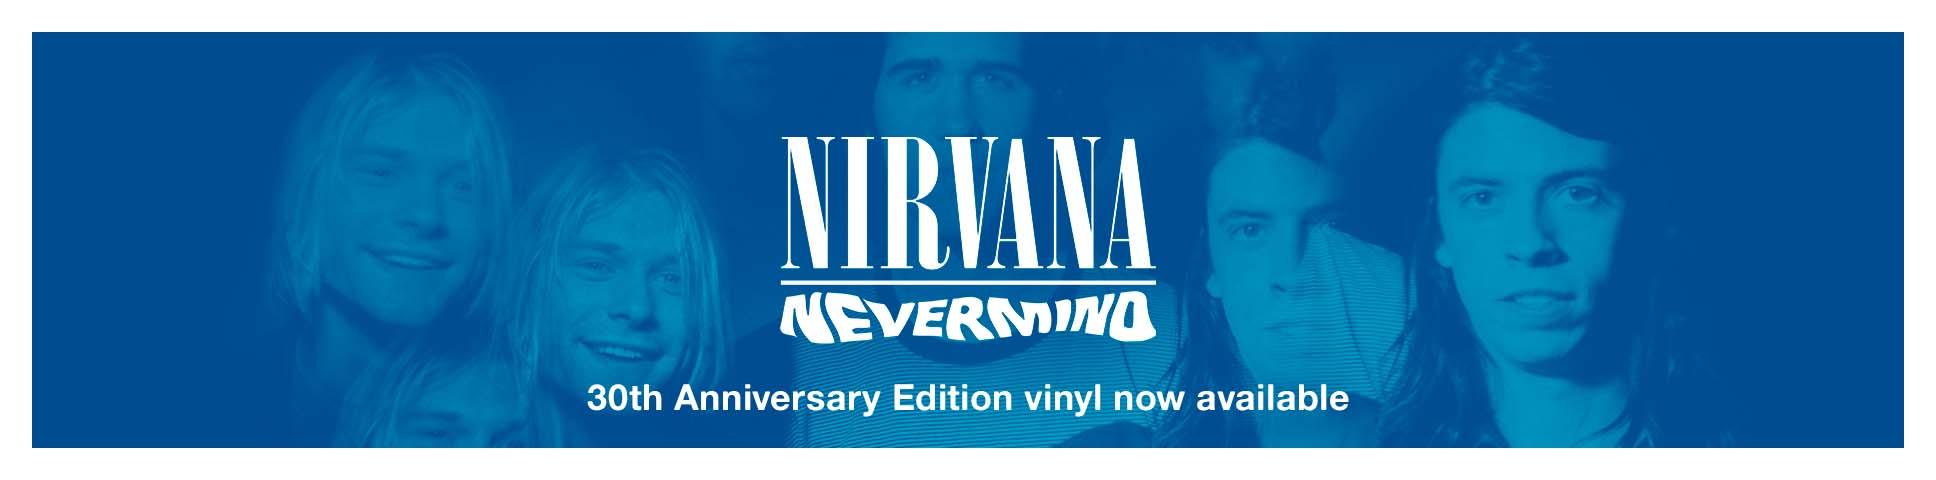 HUM Exclusive Vinyl